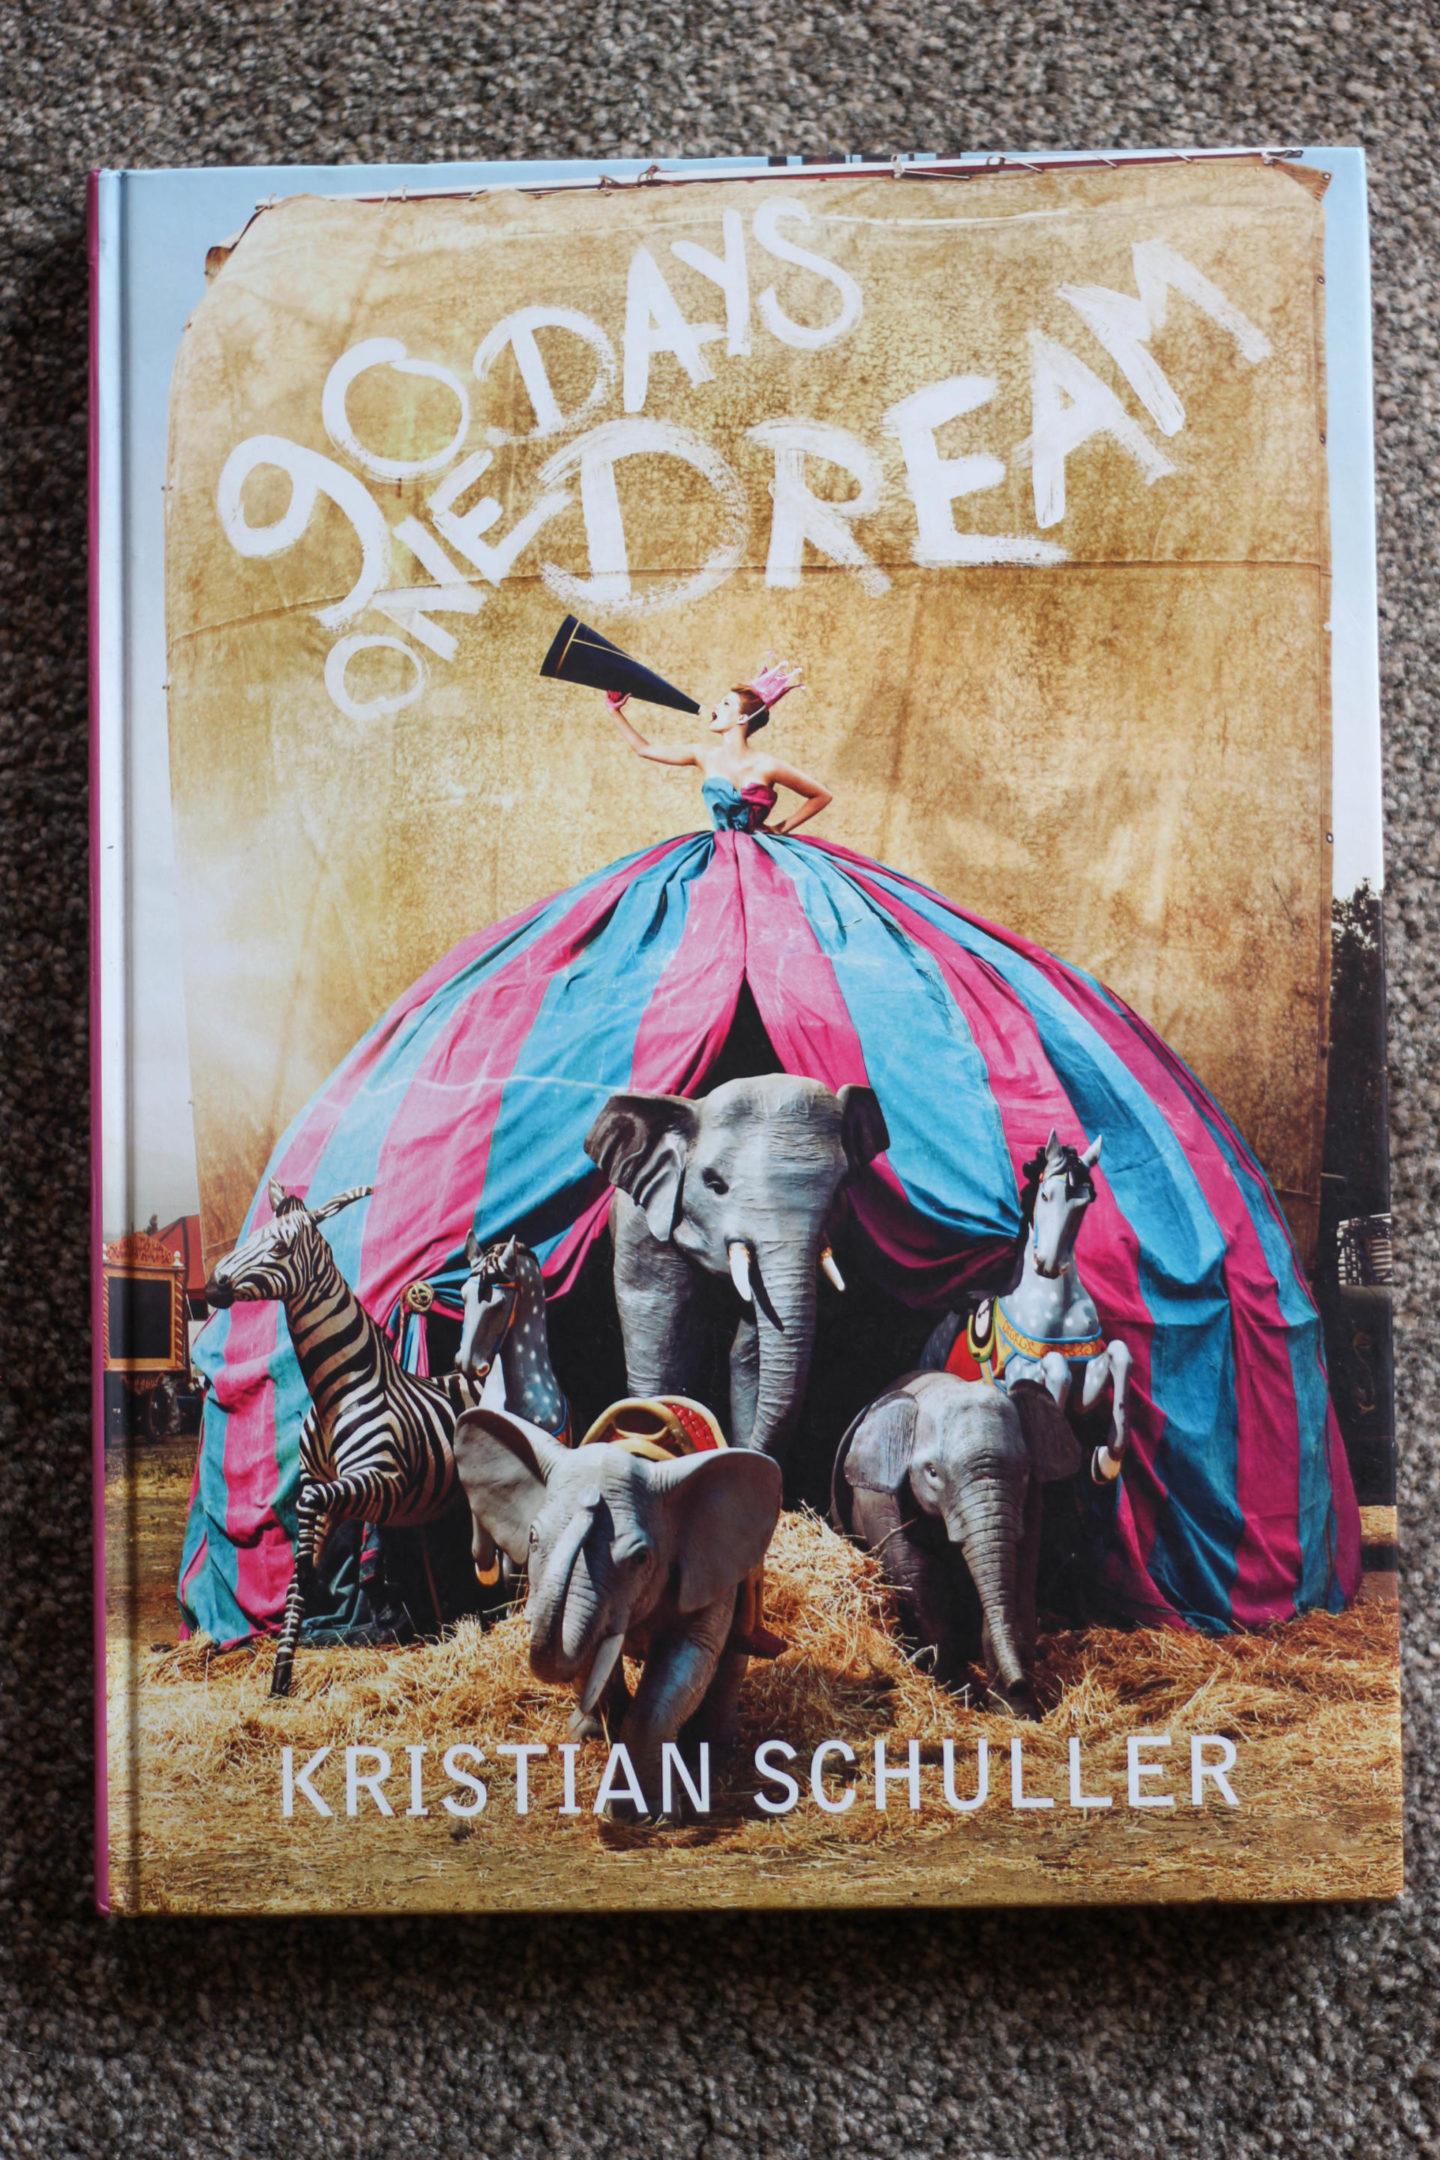 90 Days One Dream Kristian Schuller